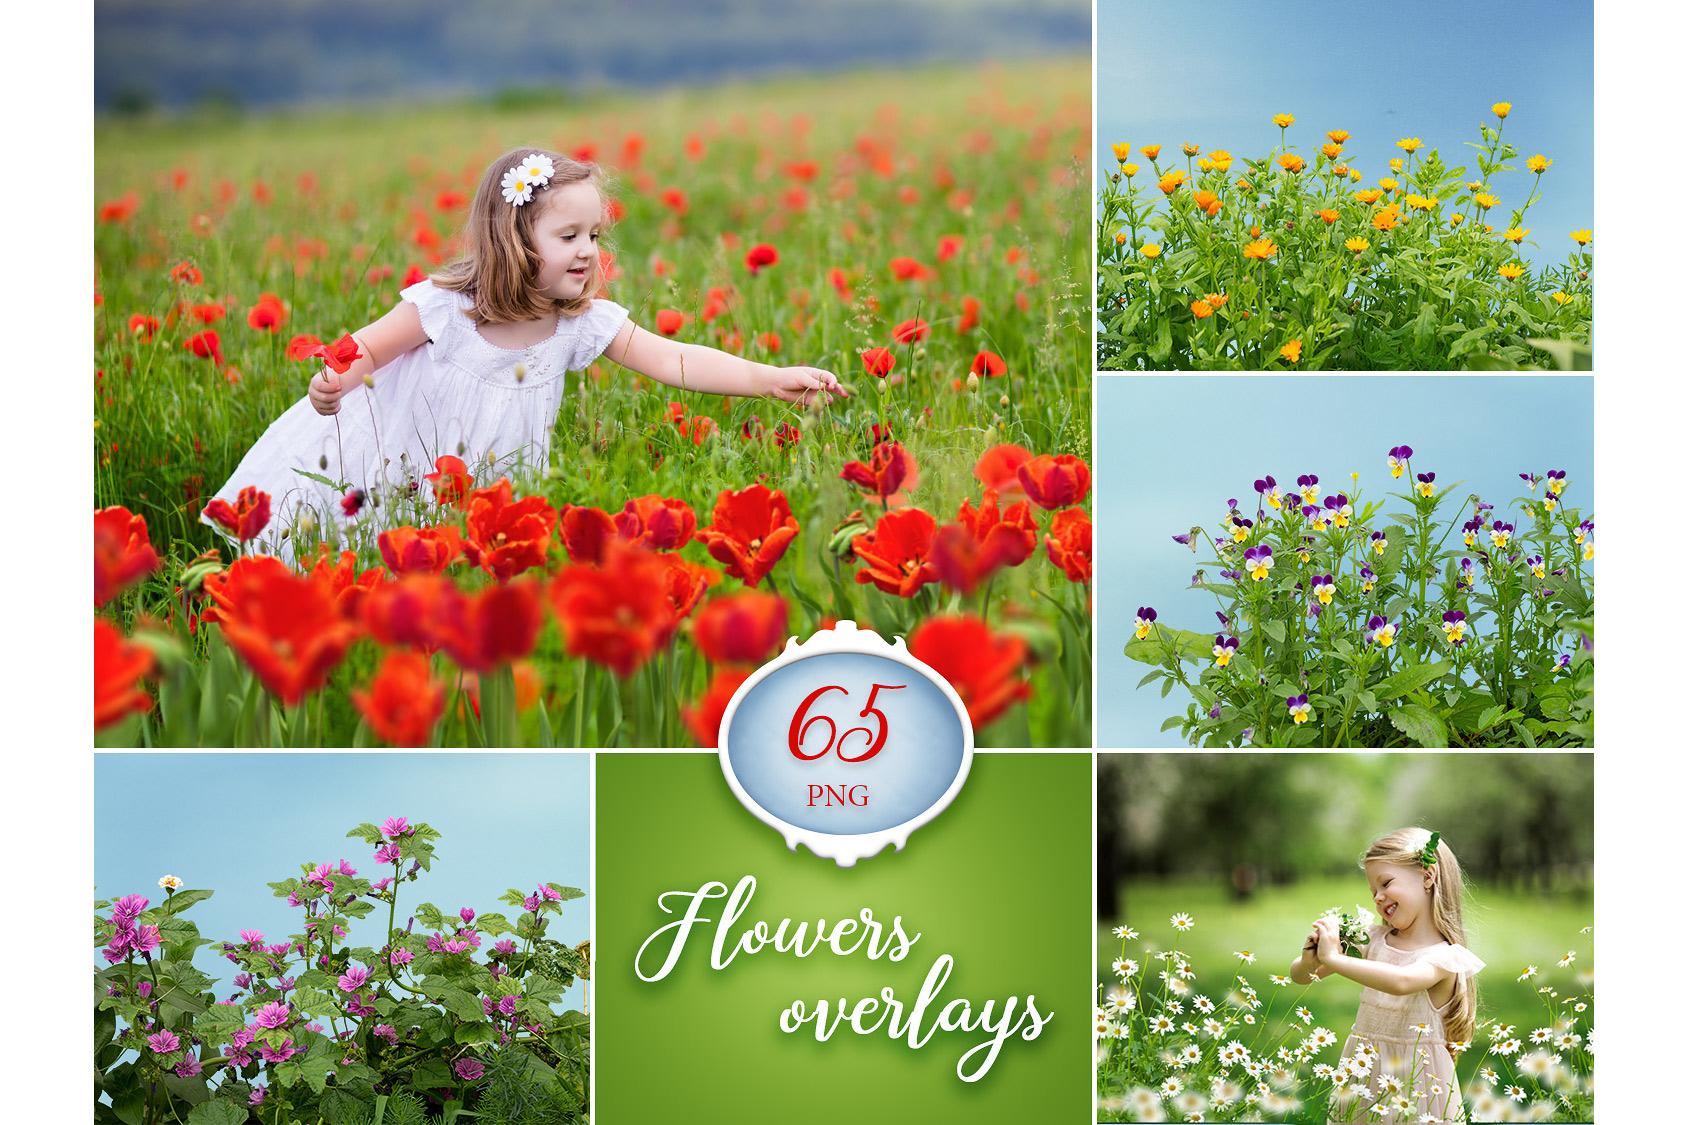 65 Flower Photo Overlays example image 1